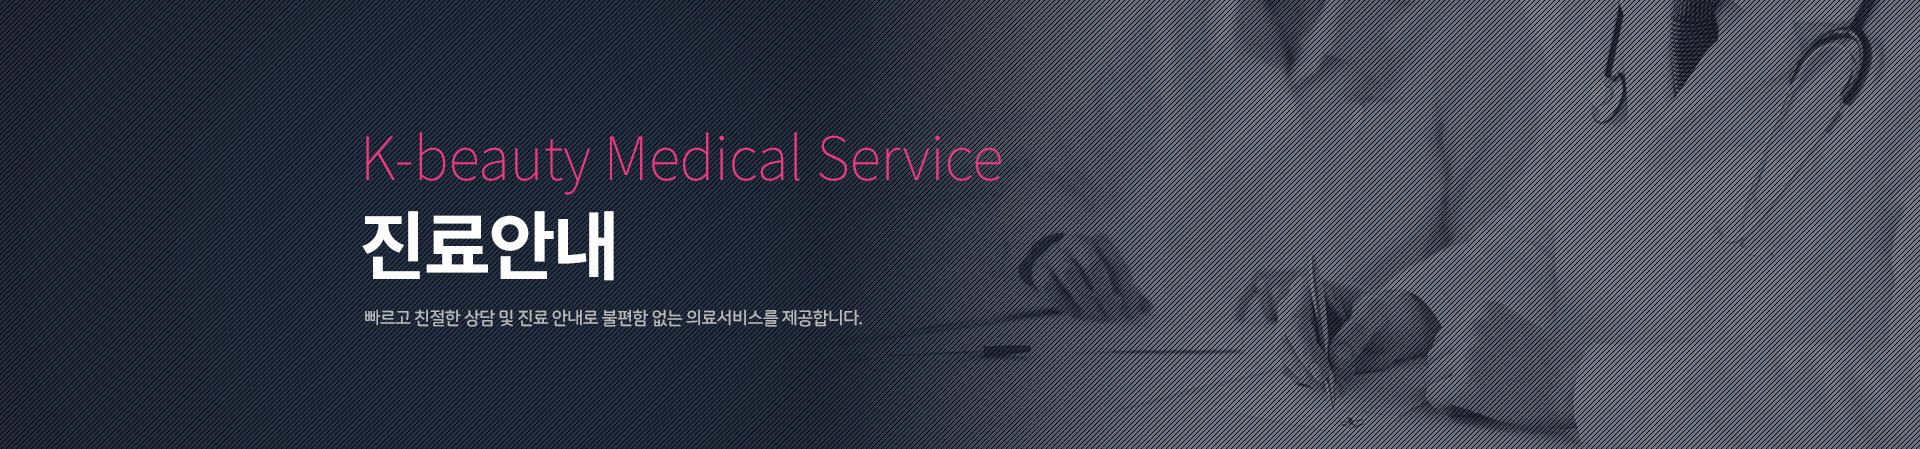 GK Medical Service 진료안내